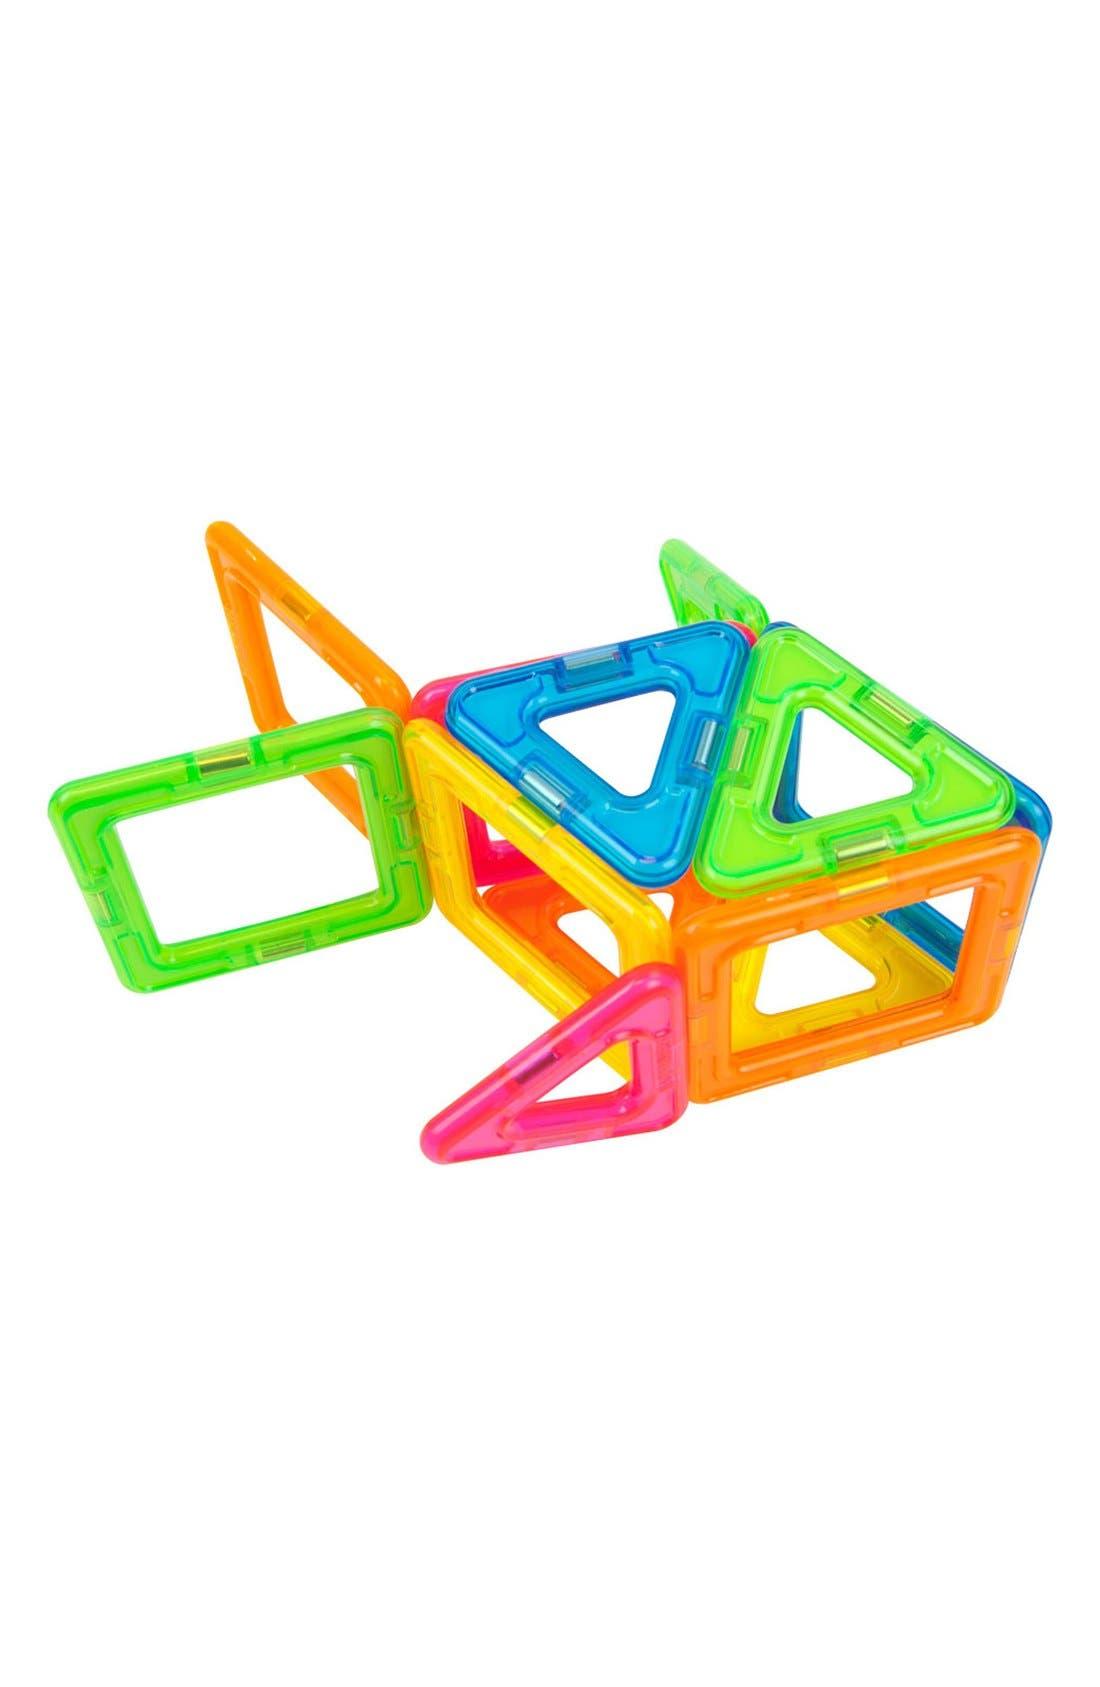 'Creator' Neon Magnetic 3D Construction Set,                             Alternate thumbnail 7, color,                             Neon Rainbow